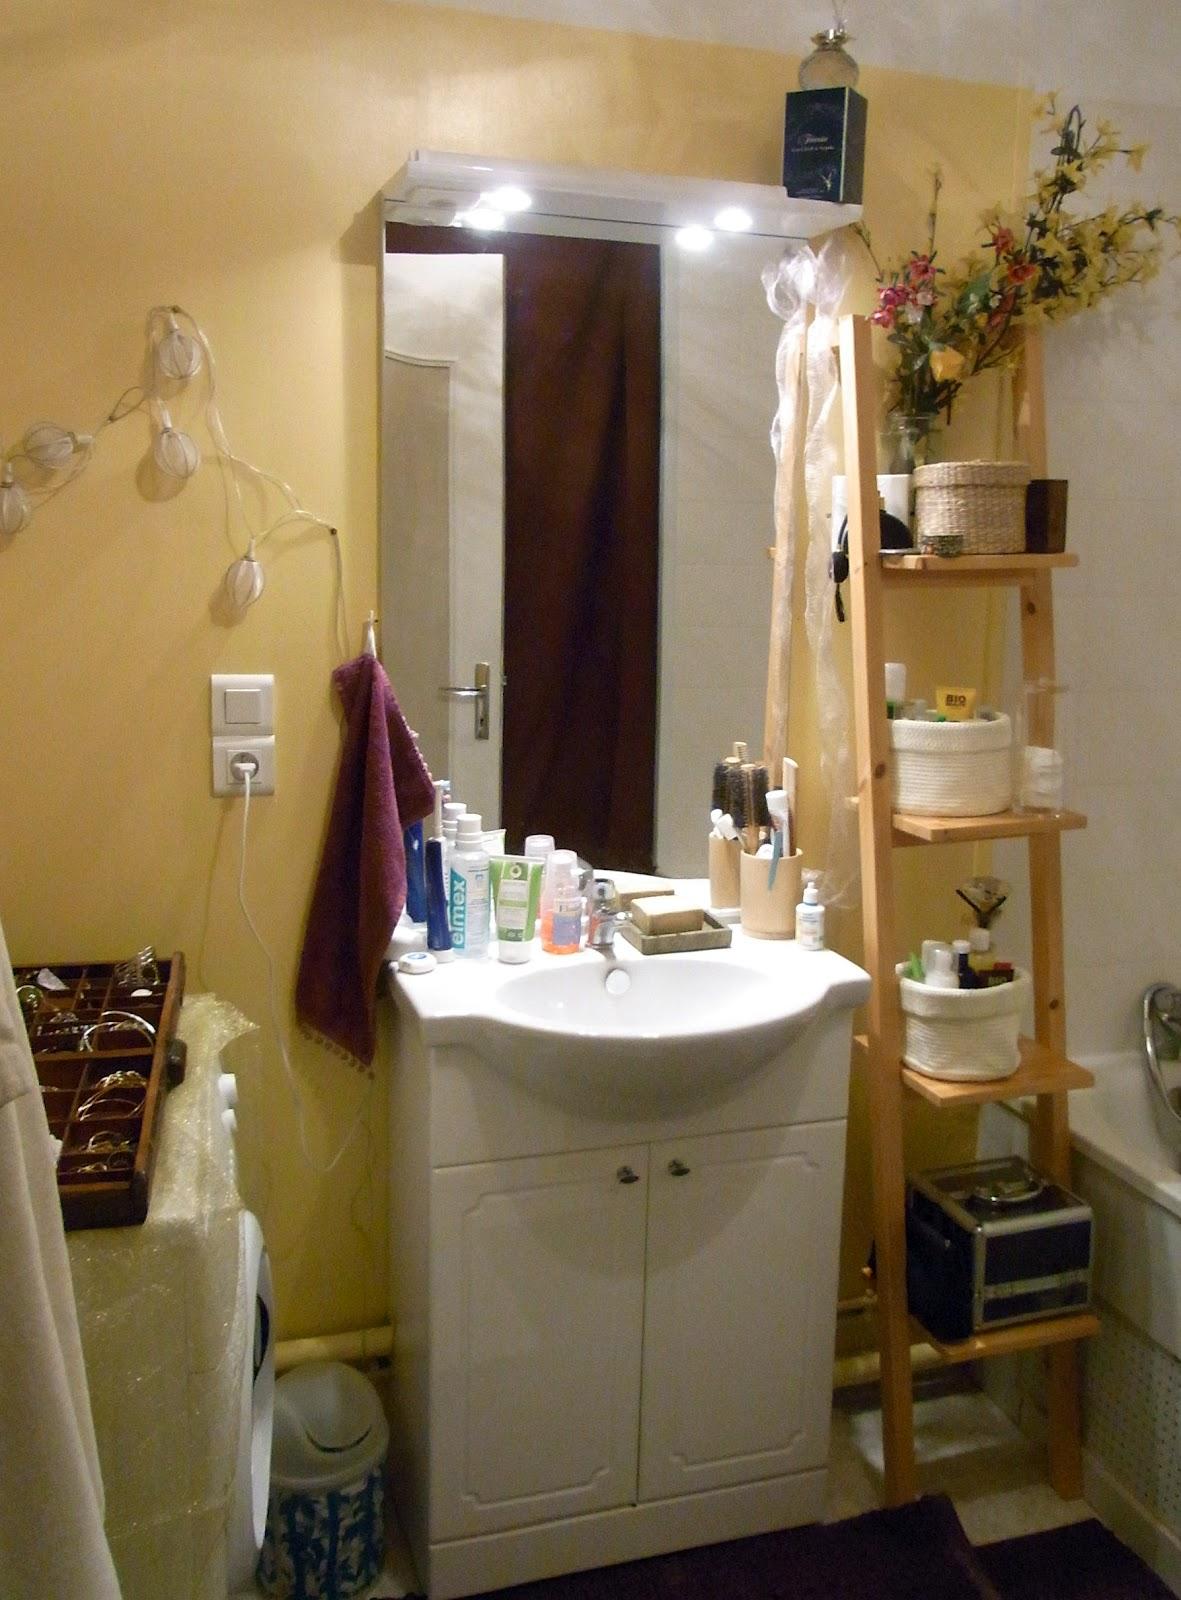 Meuble salle de bain ikea occasion - Toute petite salle de bain ...